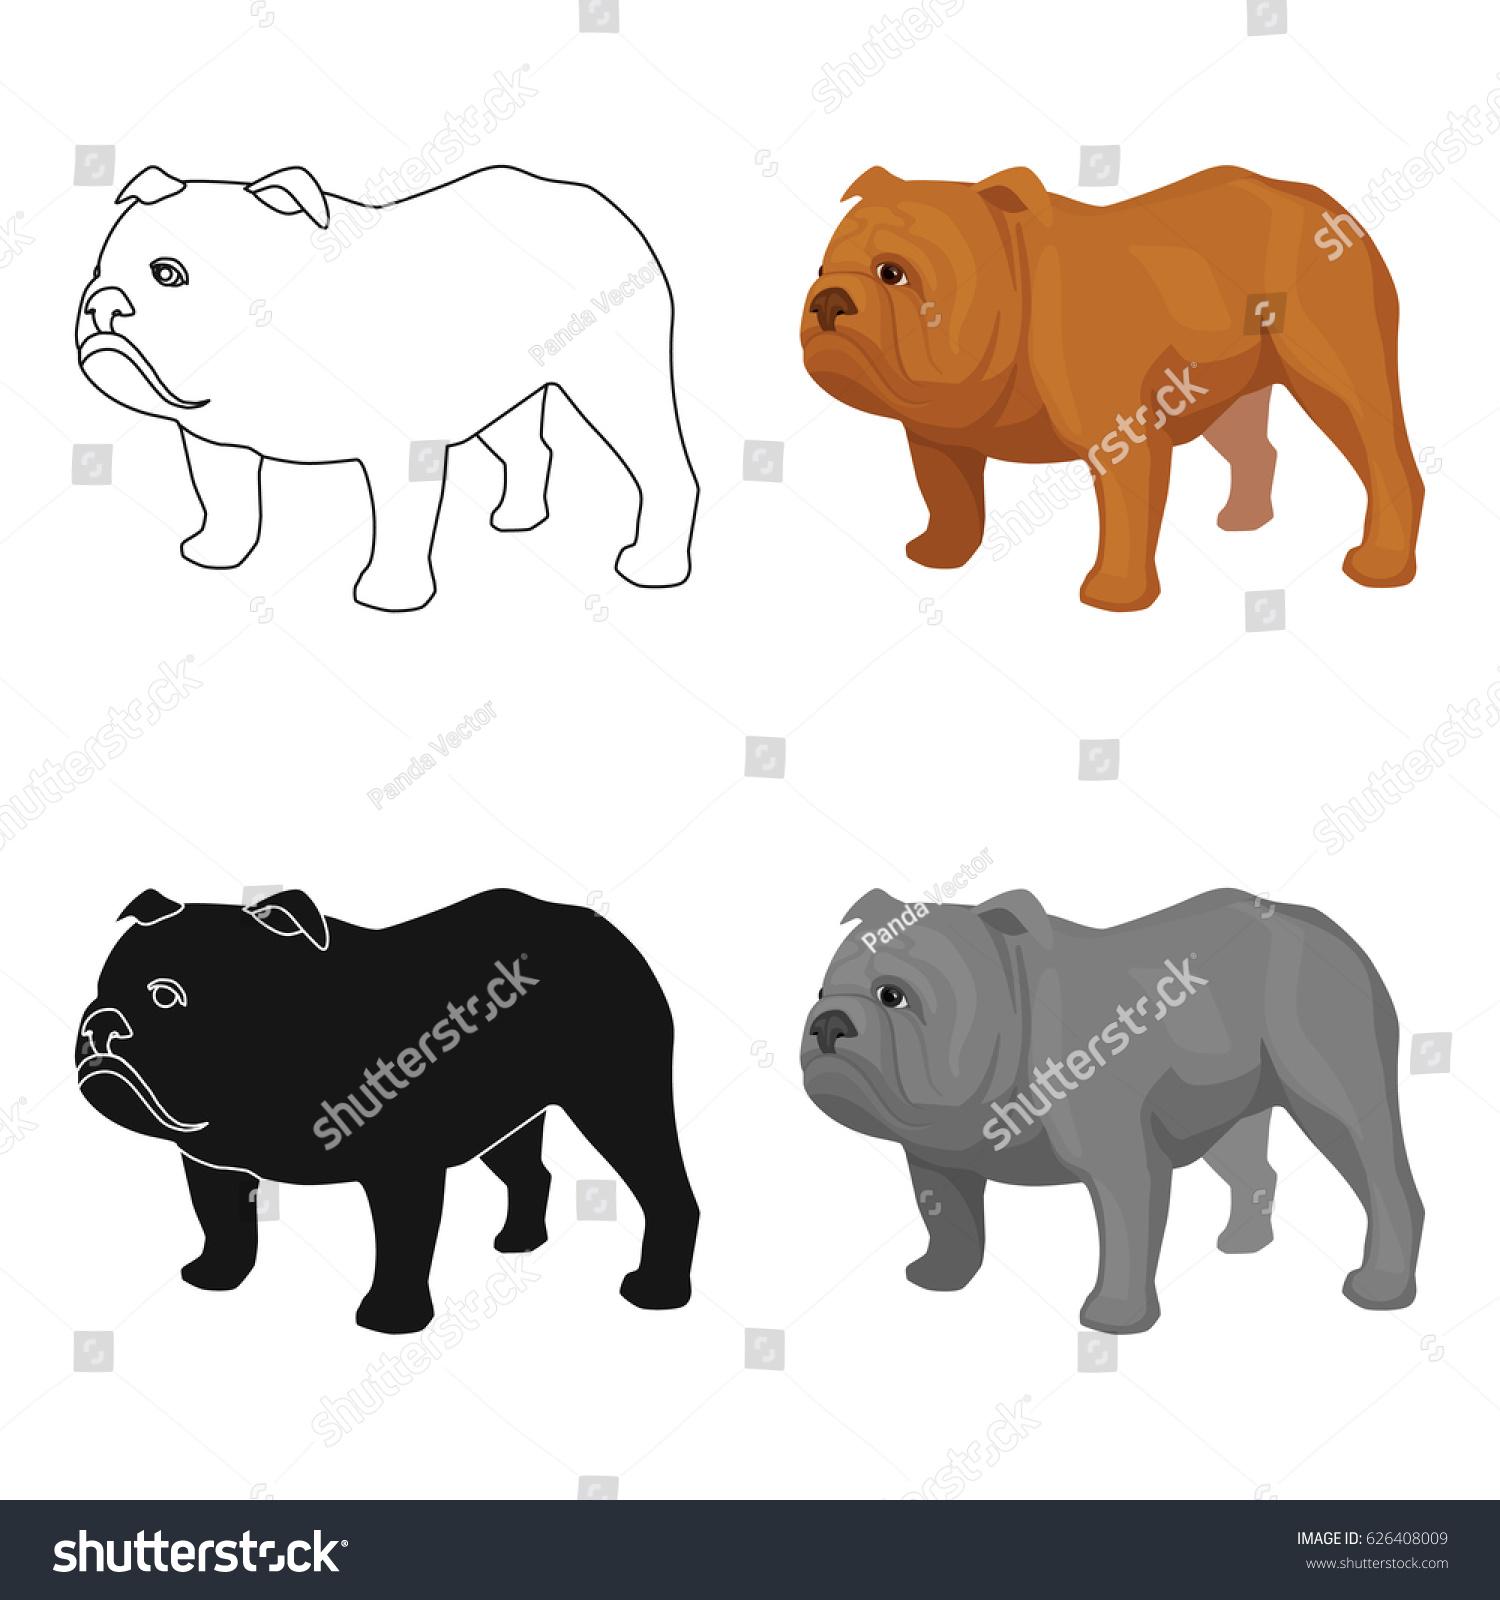 English bulldog icon cartoon style isolated stock vector 626408009 english bulldog icon in cartoon style isolated on white background england country symbol stock vector biocorpaavc